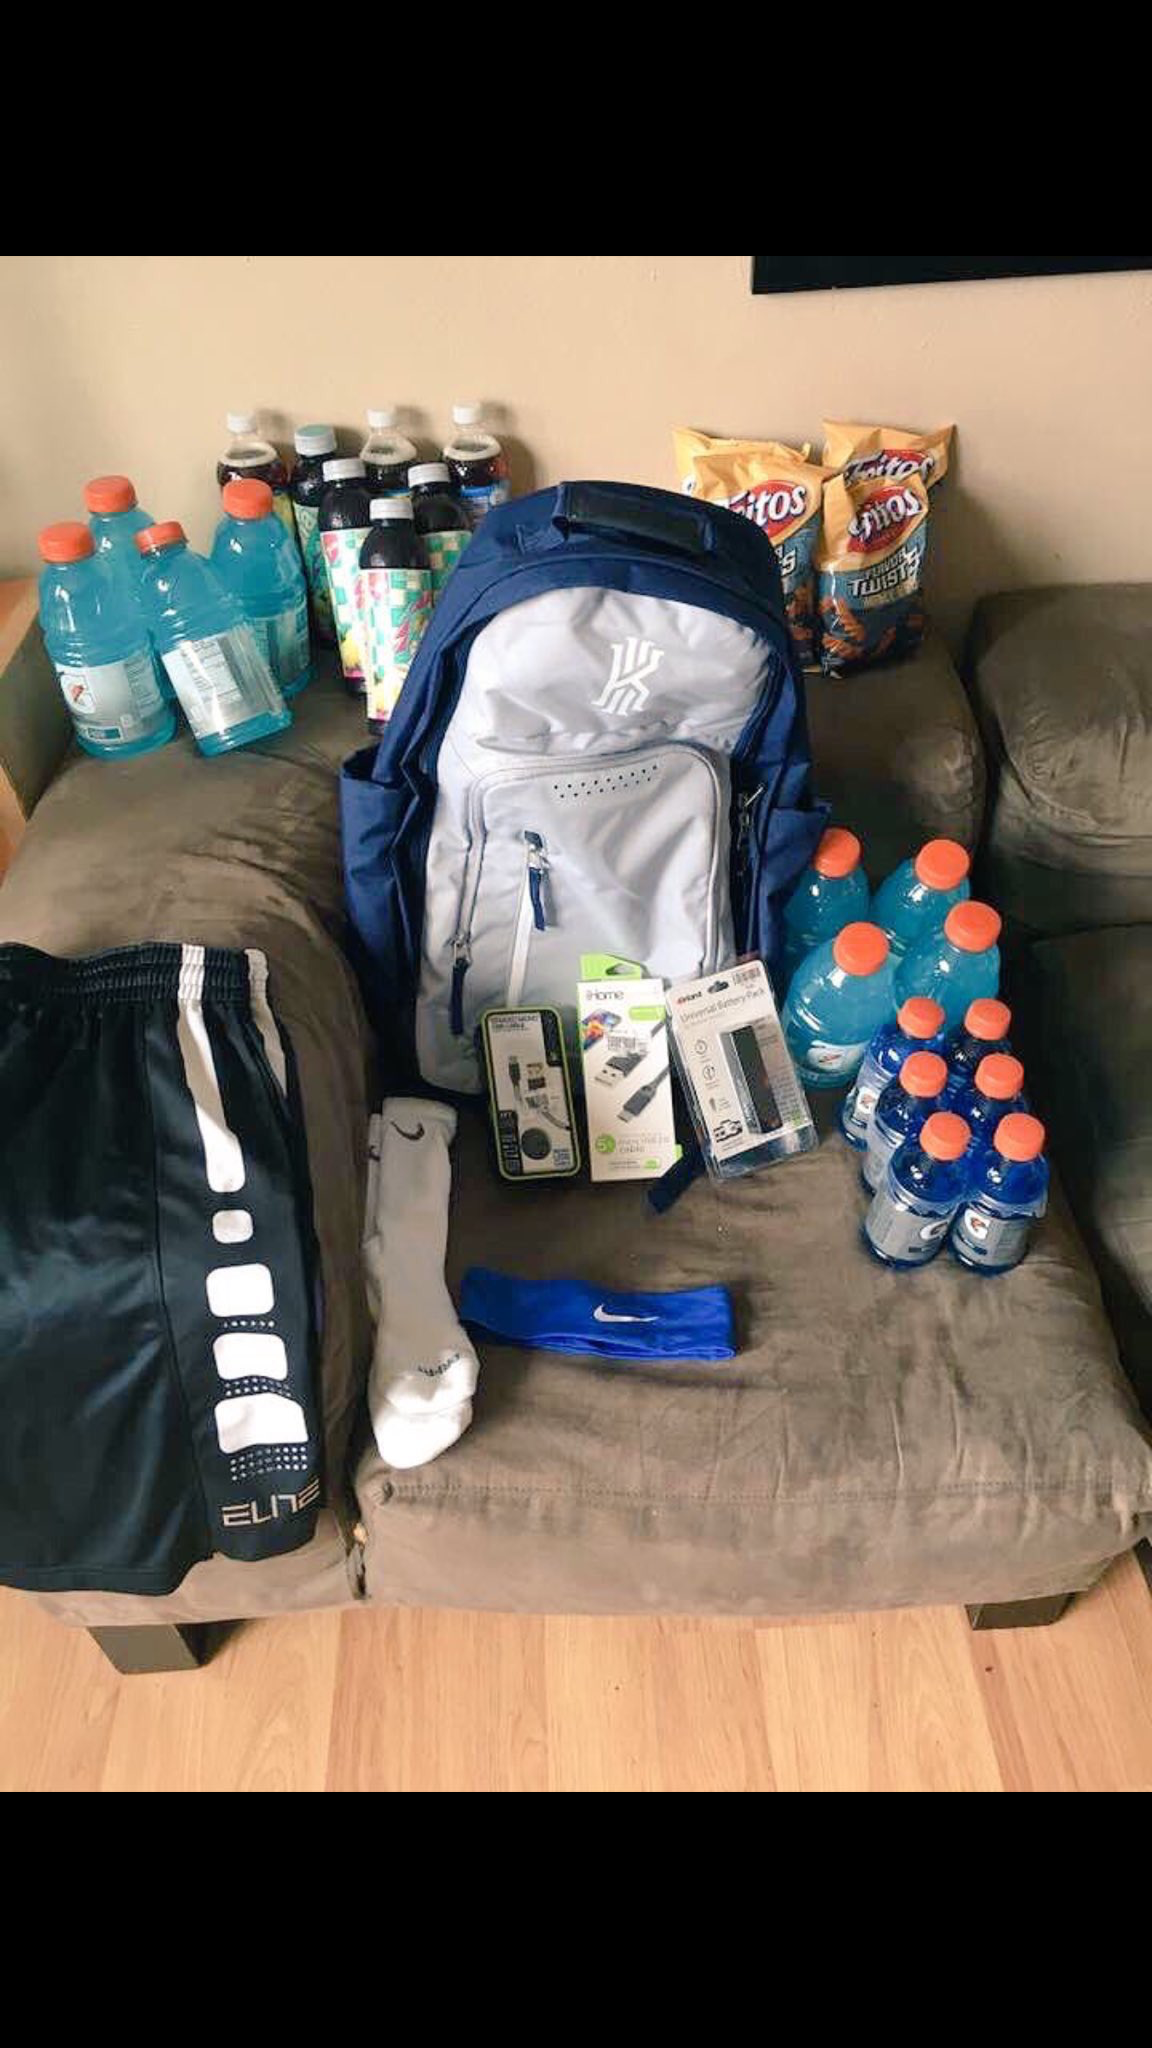 care package for basketball boyfriend | xoxo. | Pinterest ...